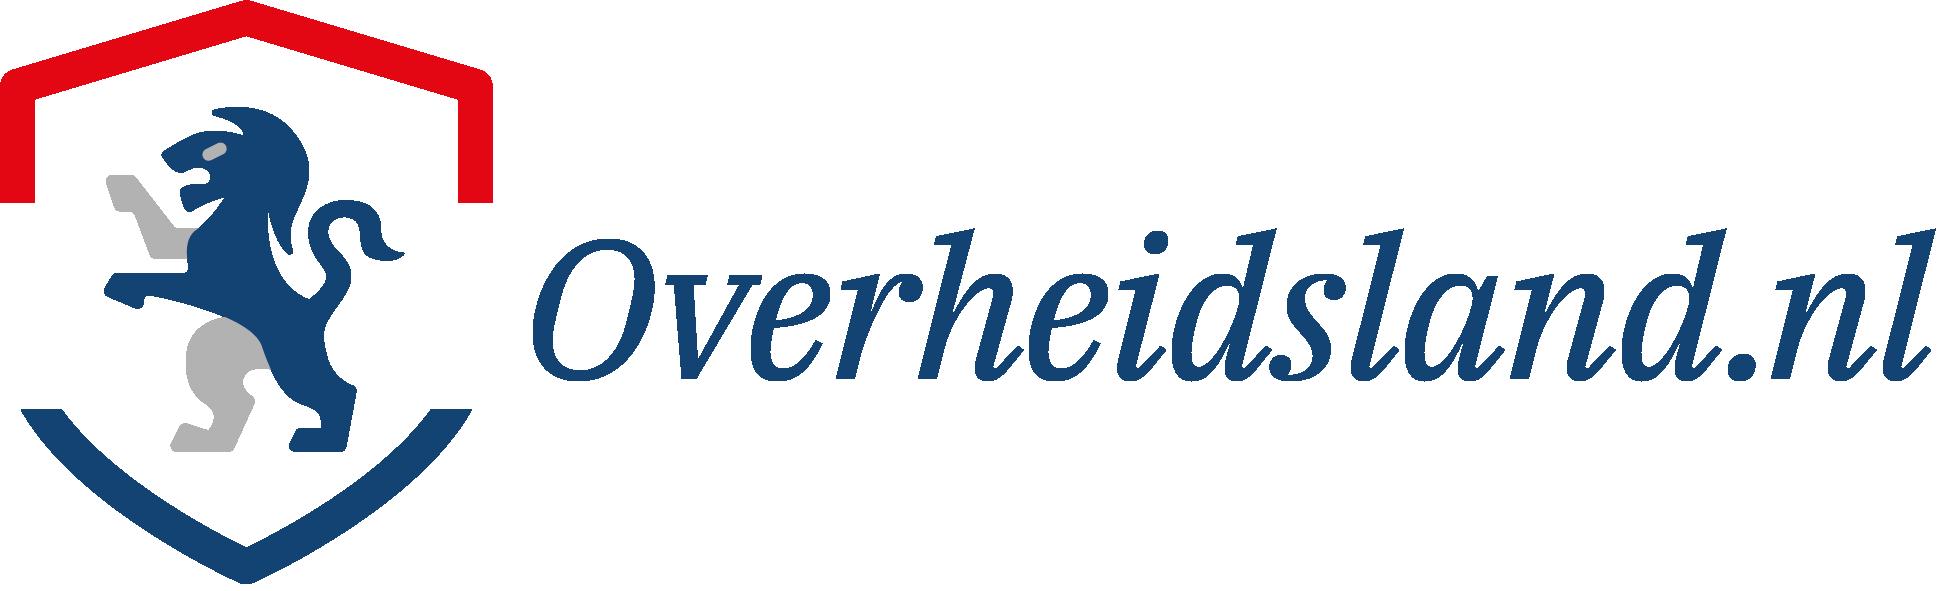 Overheidsland.nl